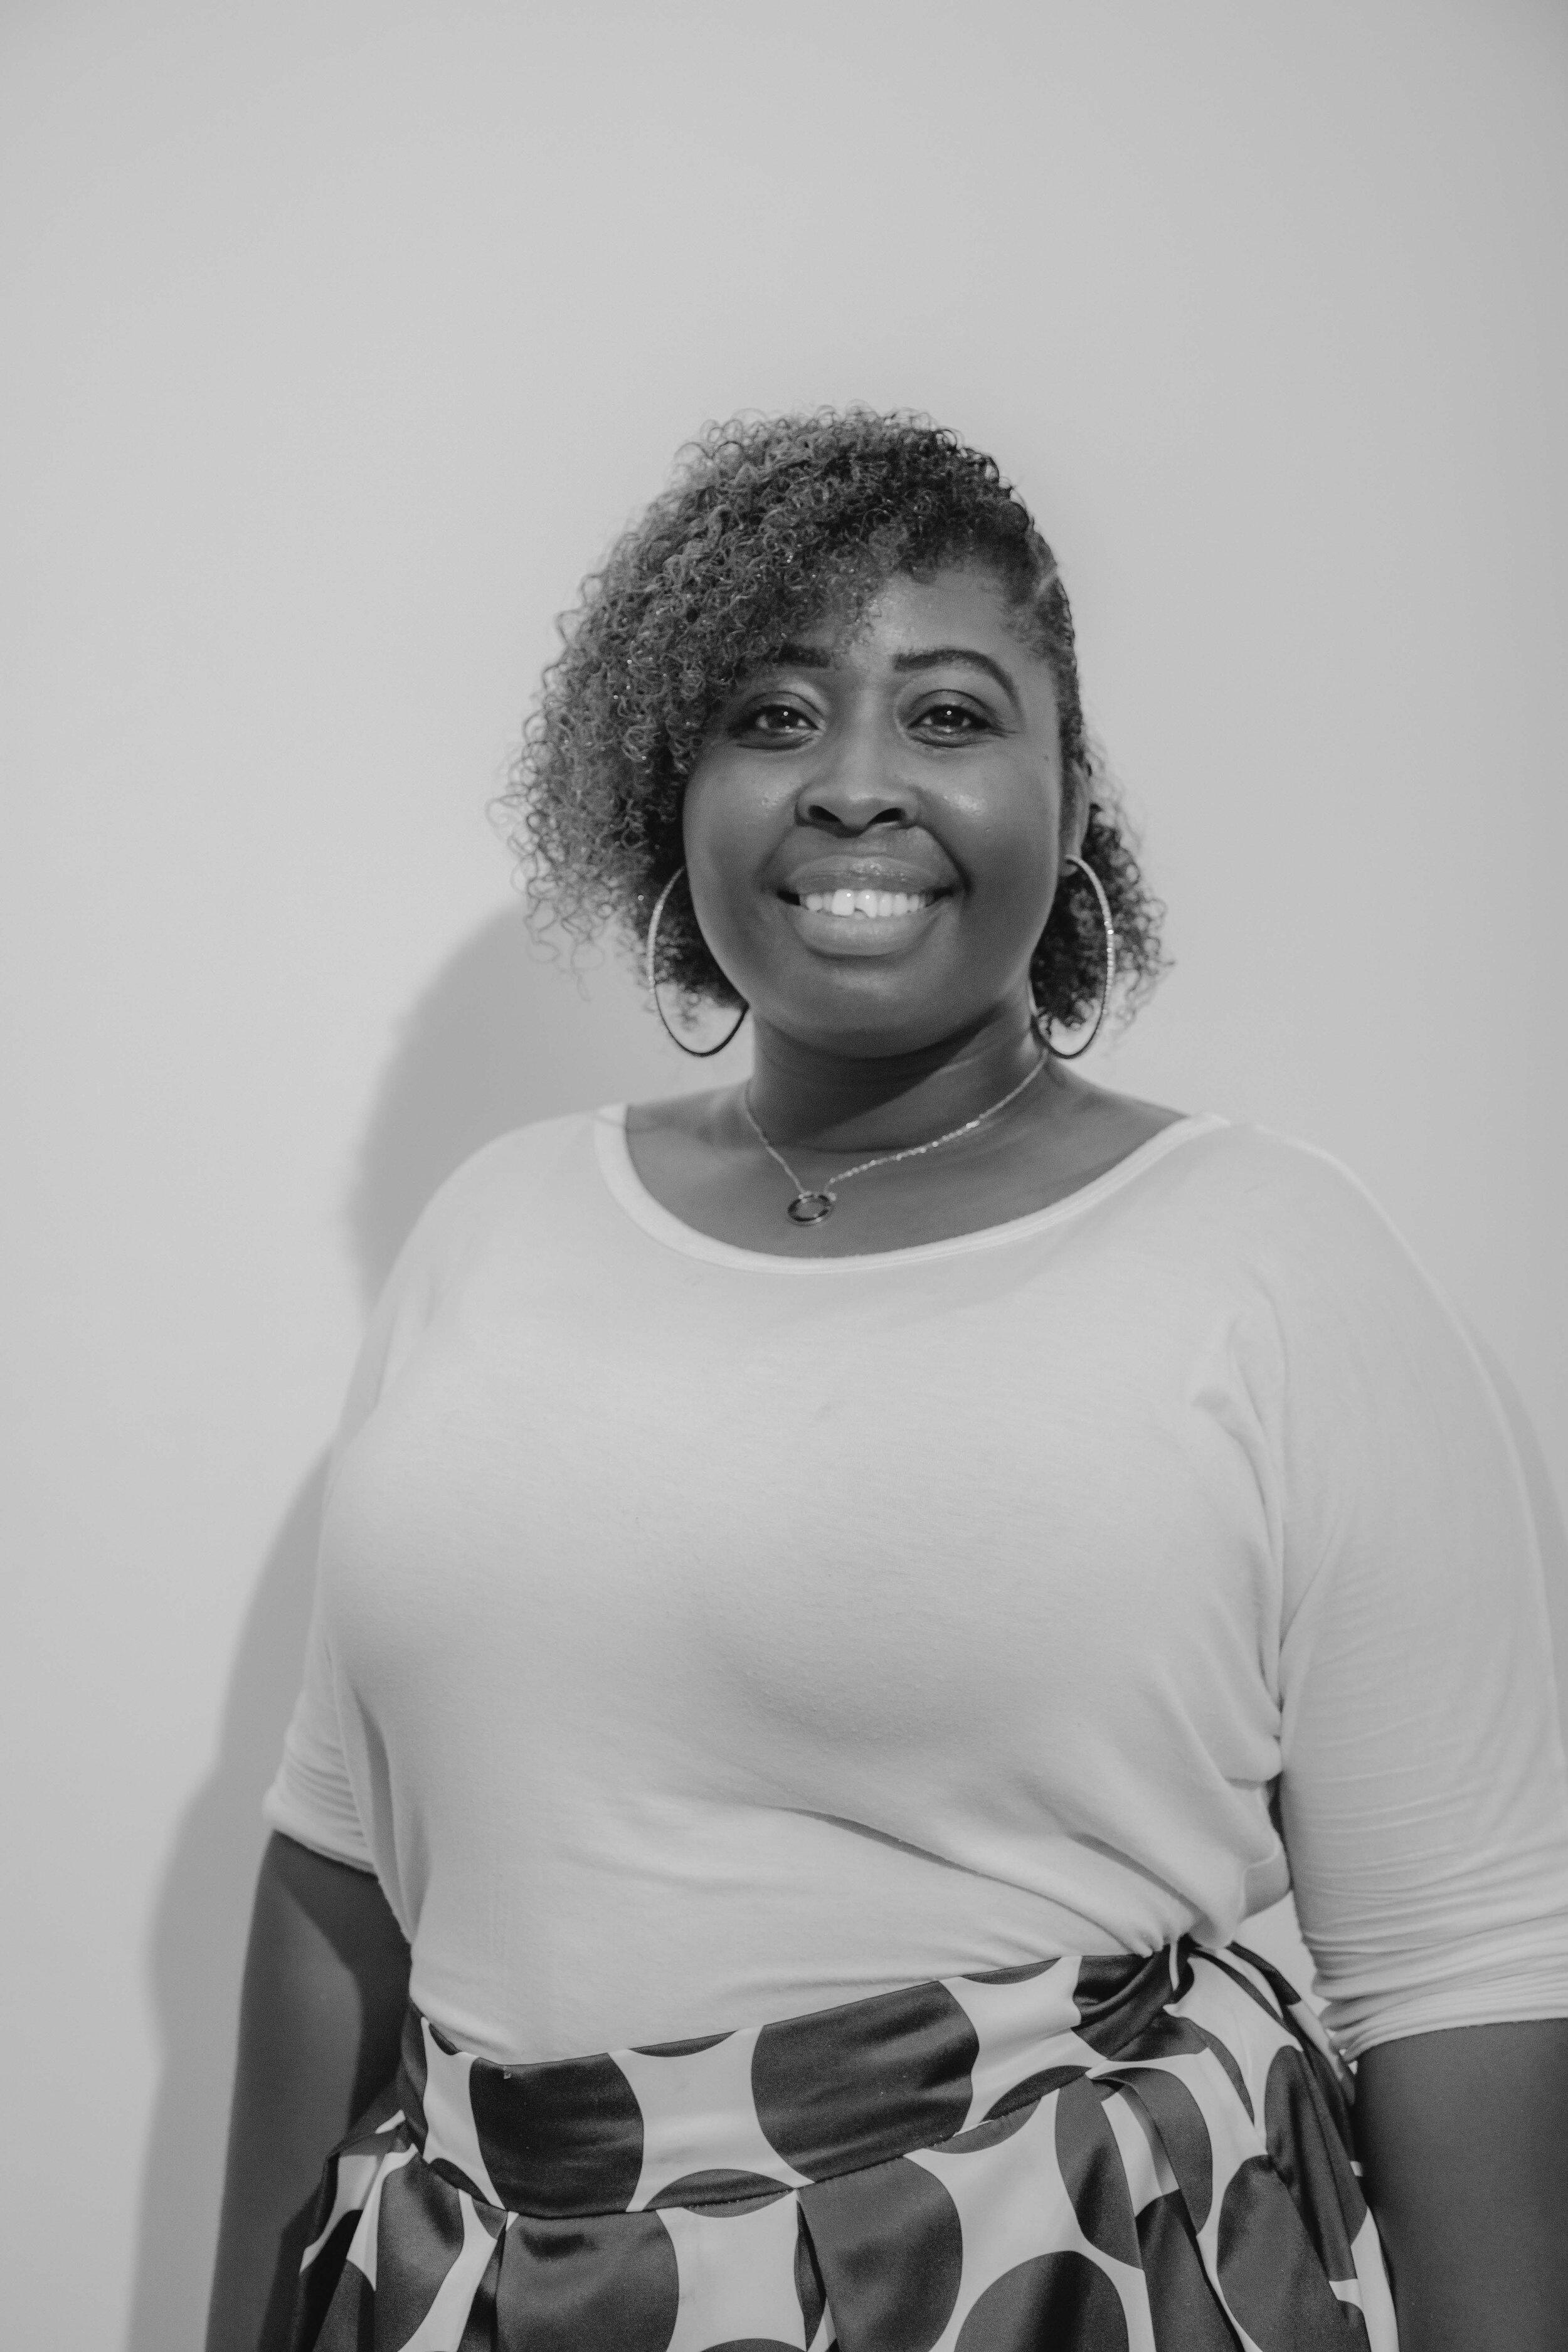 Zearier Munroe (Community Outreach Officer)